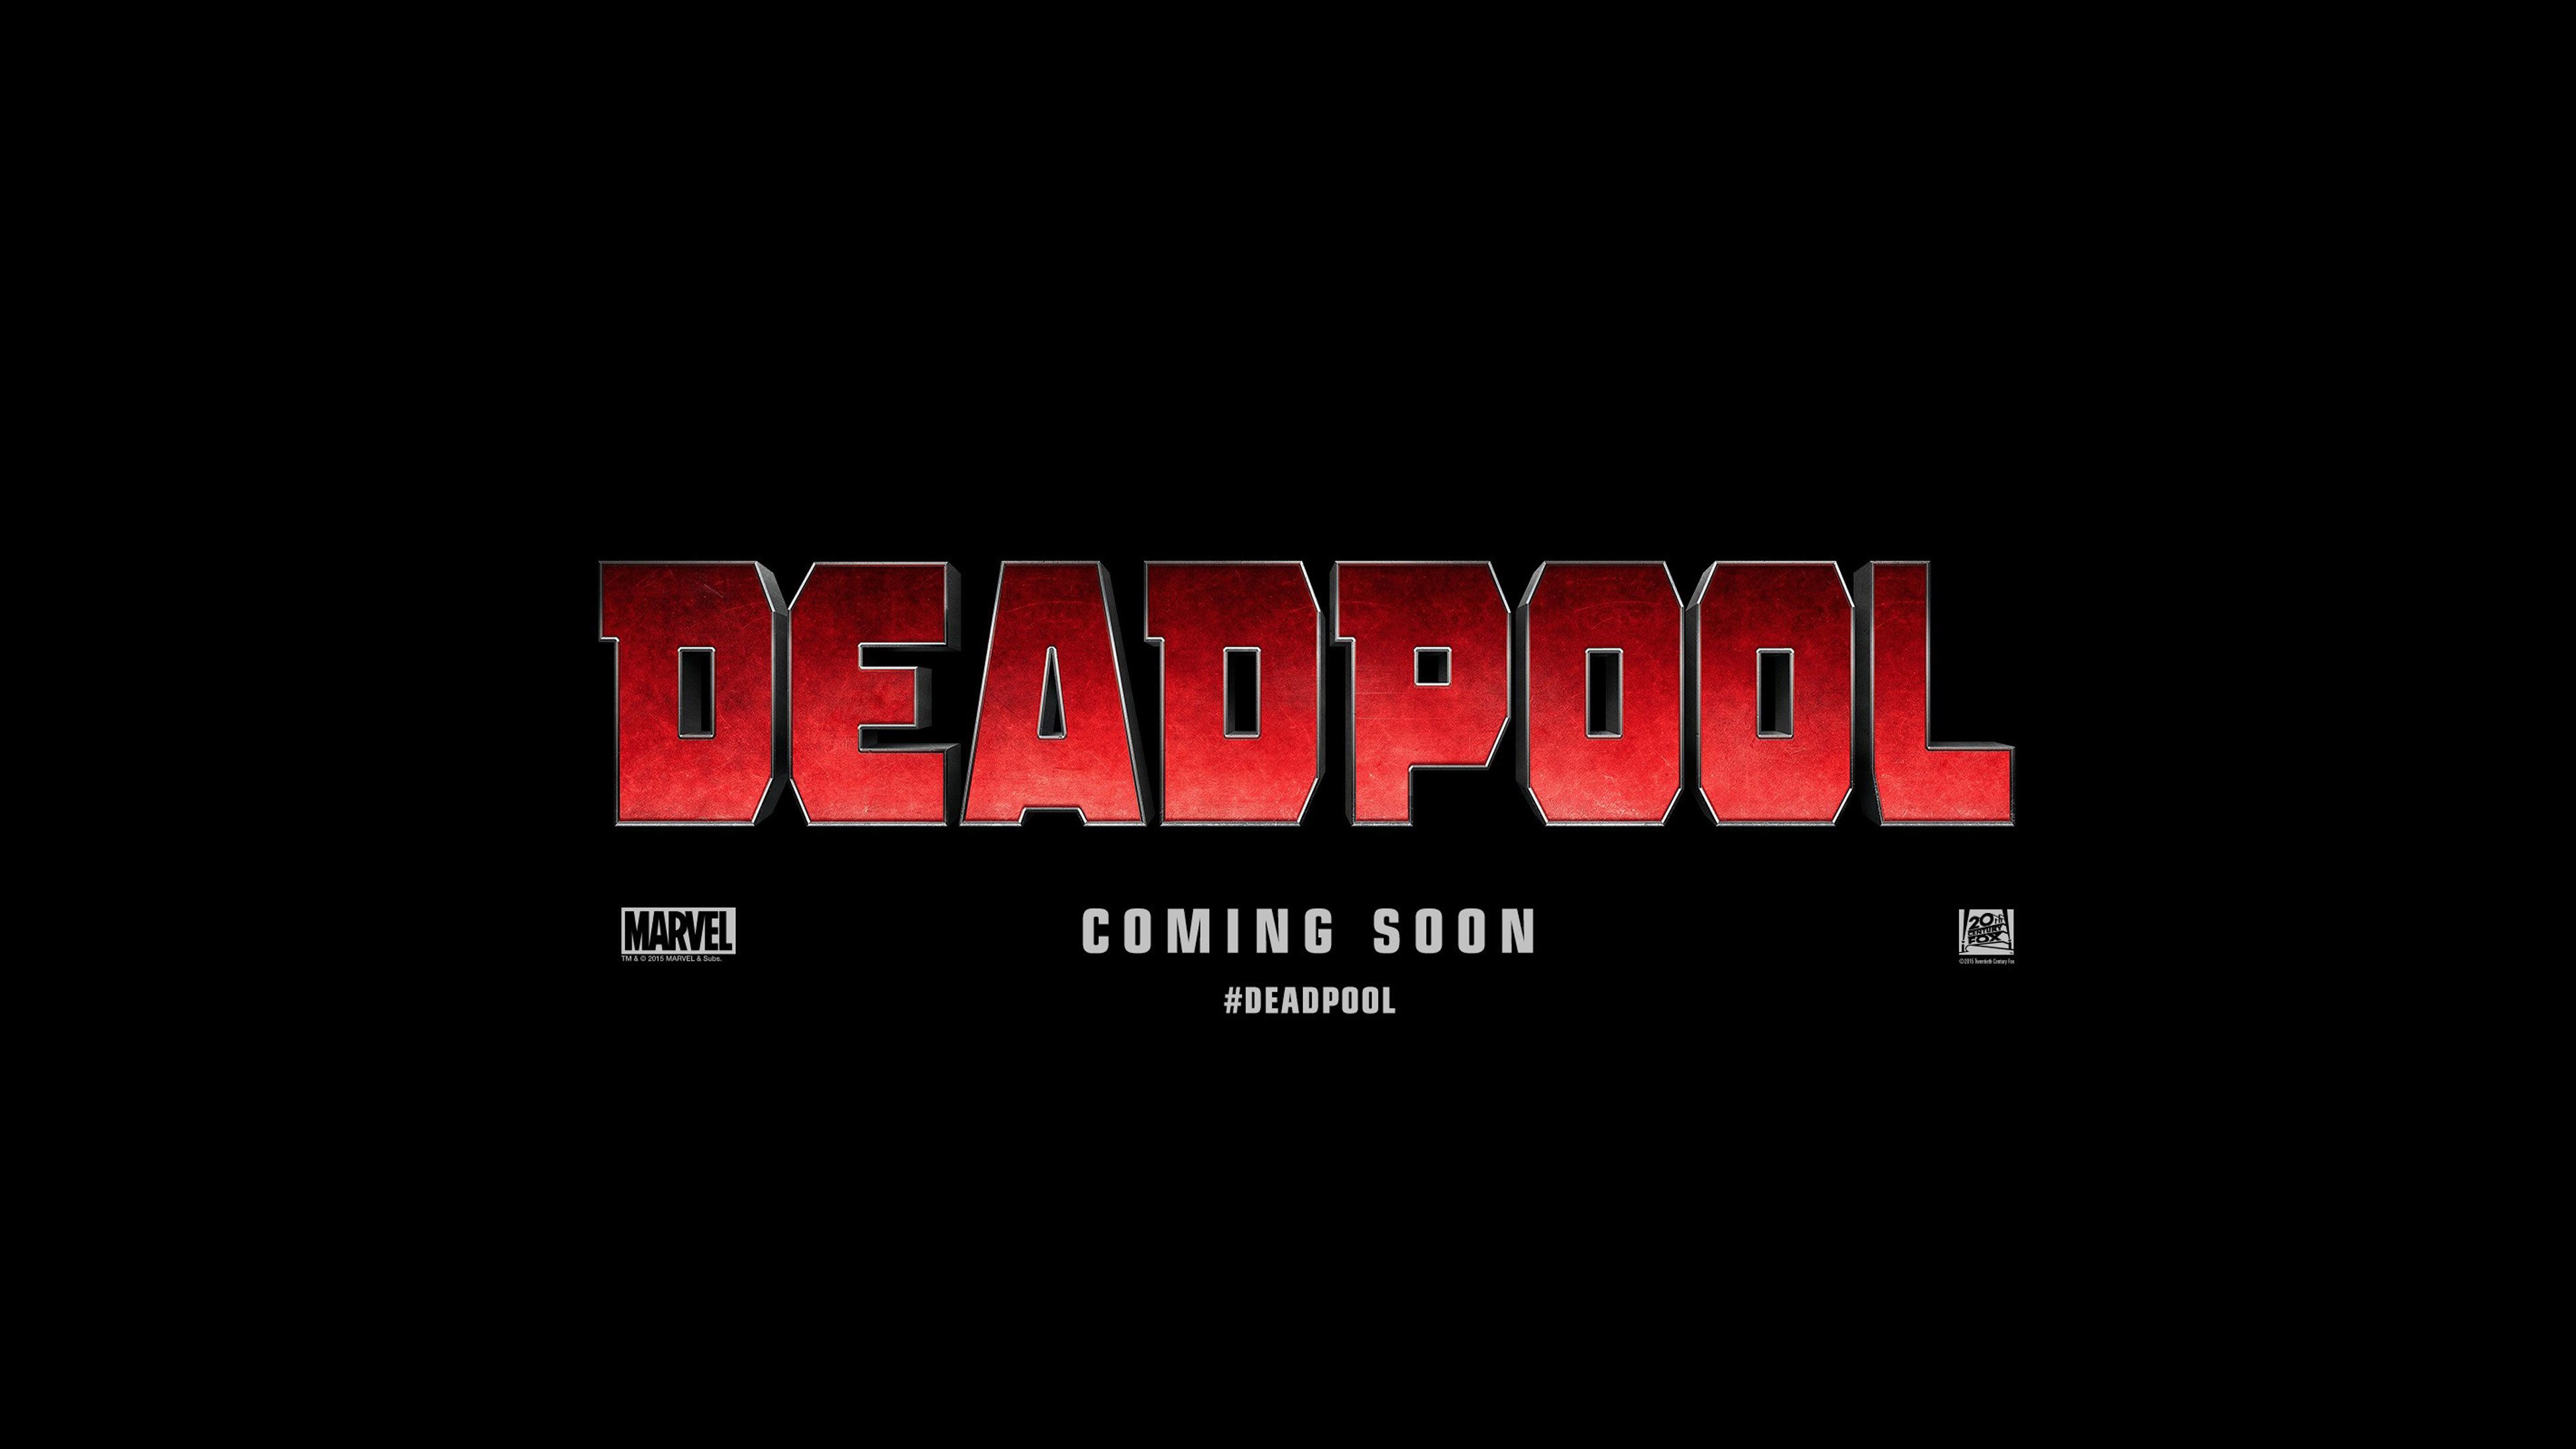 Deadpool 4K Logo wallpaper